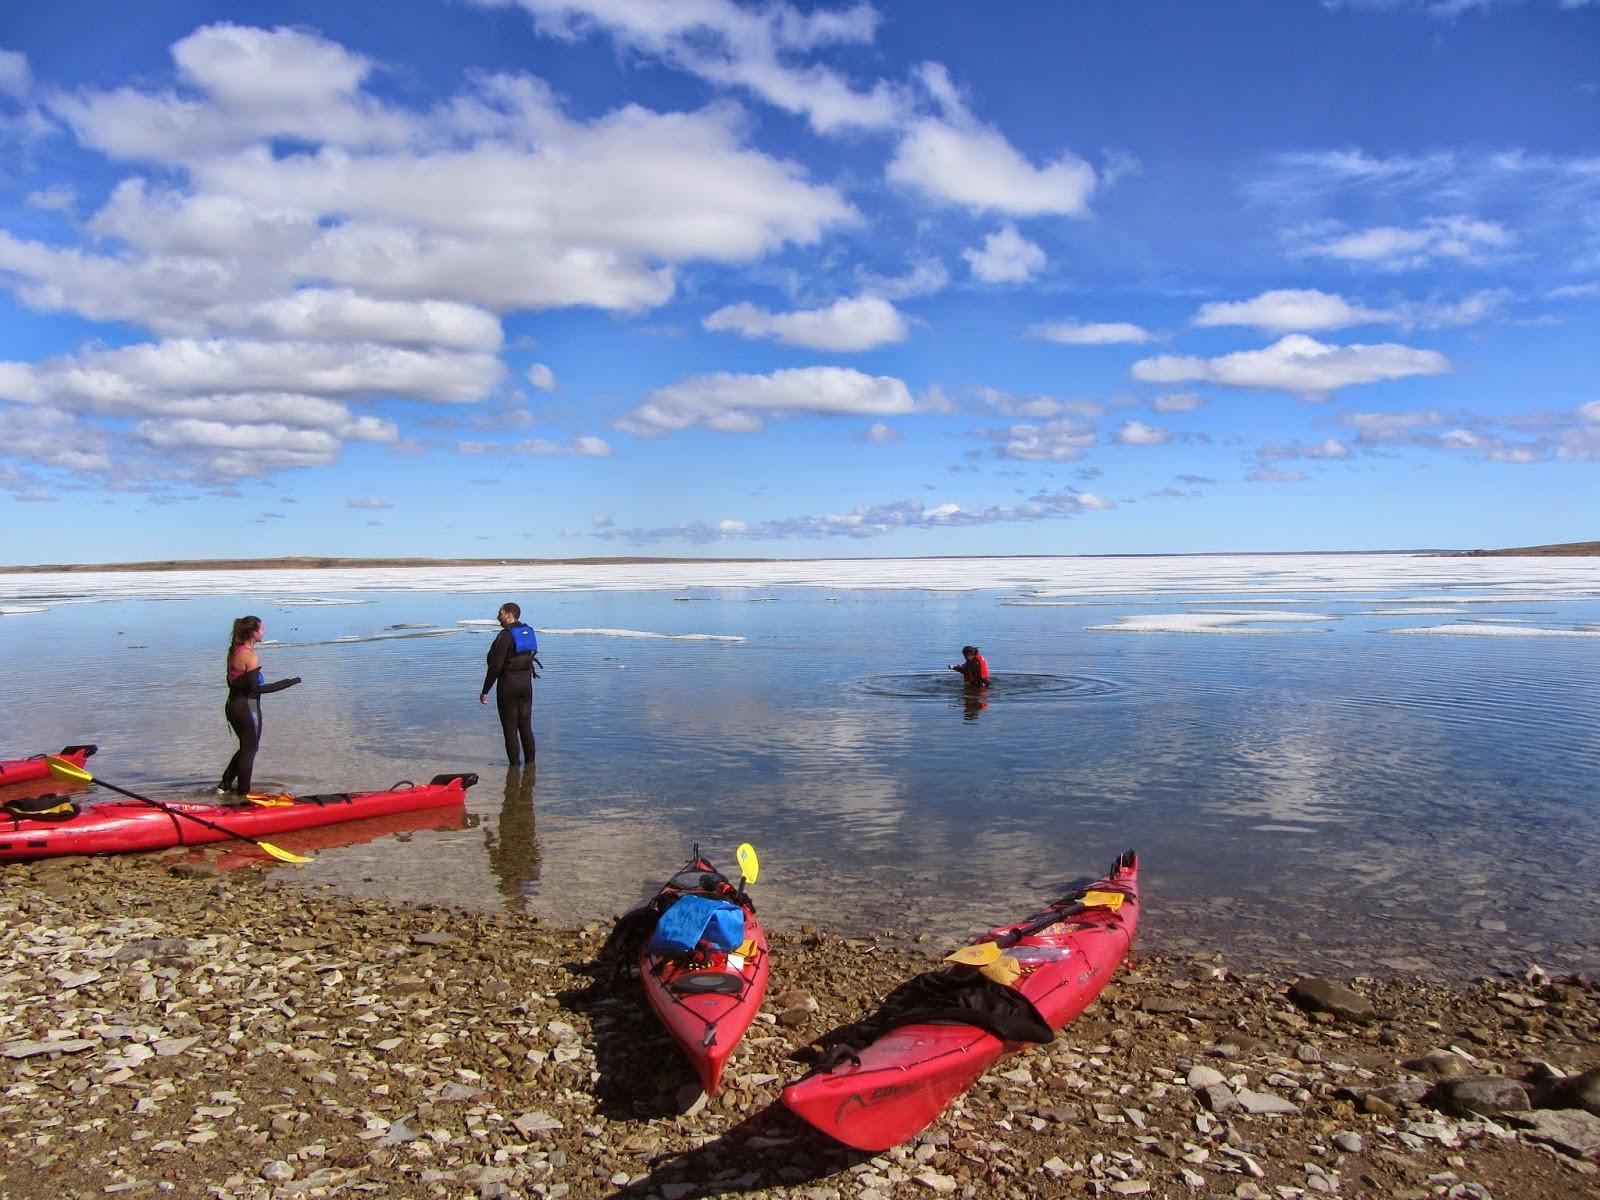 Run, Gloria, Run!: Kayaking Season In Full Swing